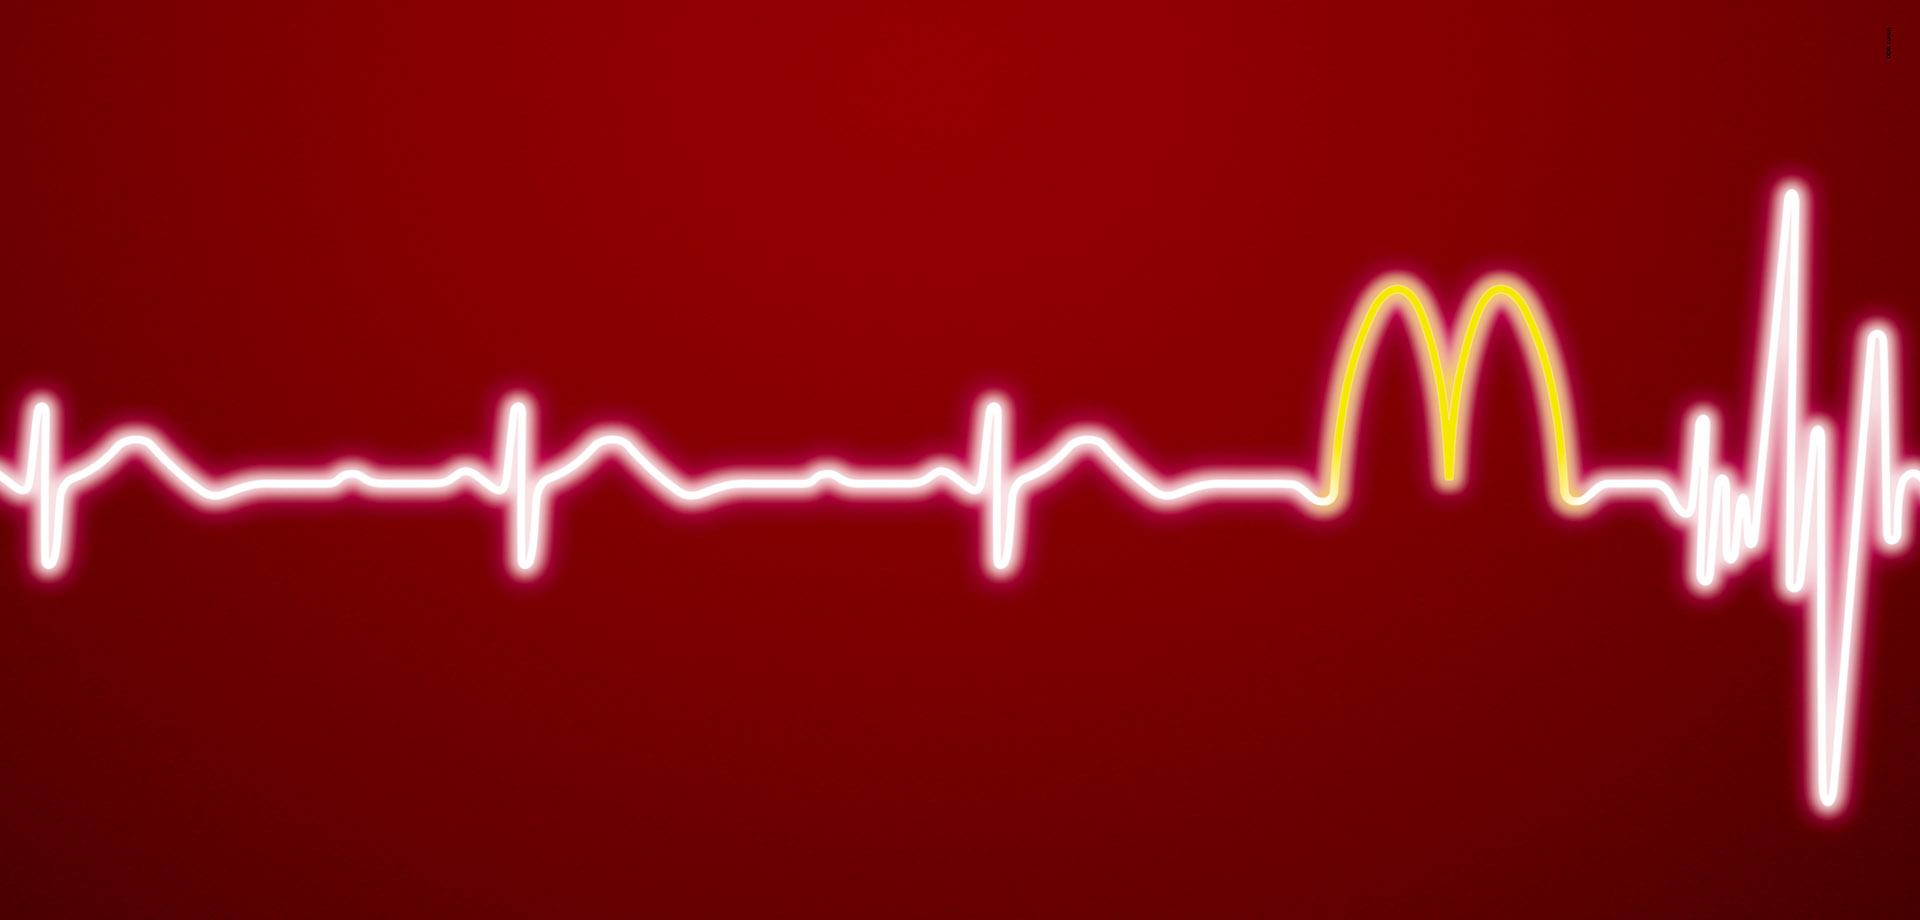 McD_Heartbeat